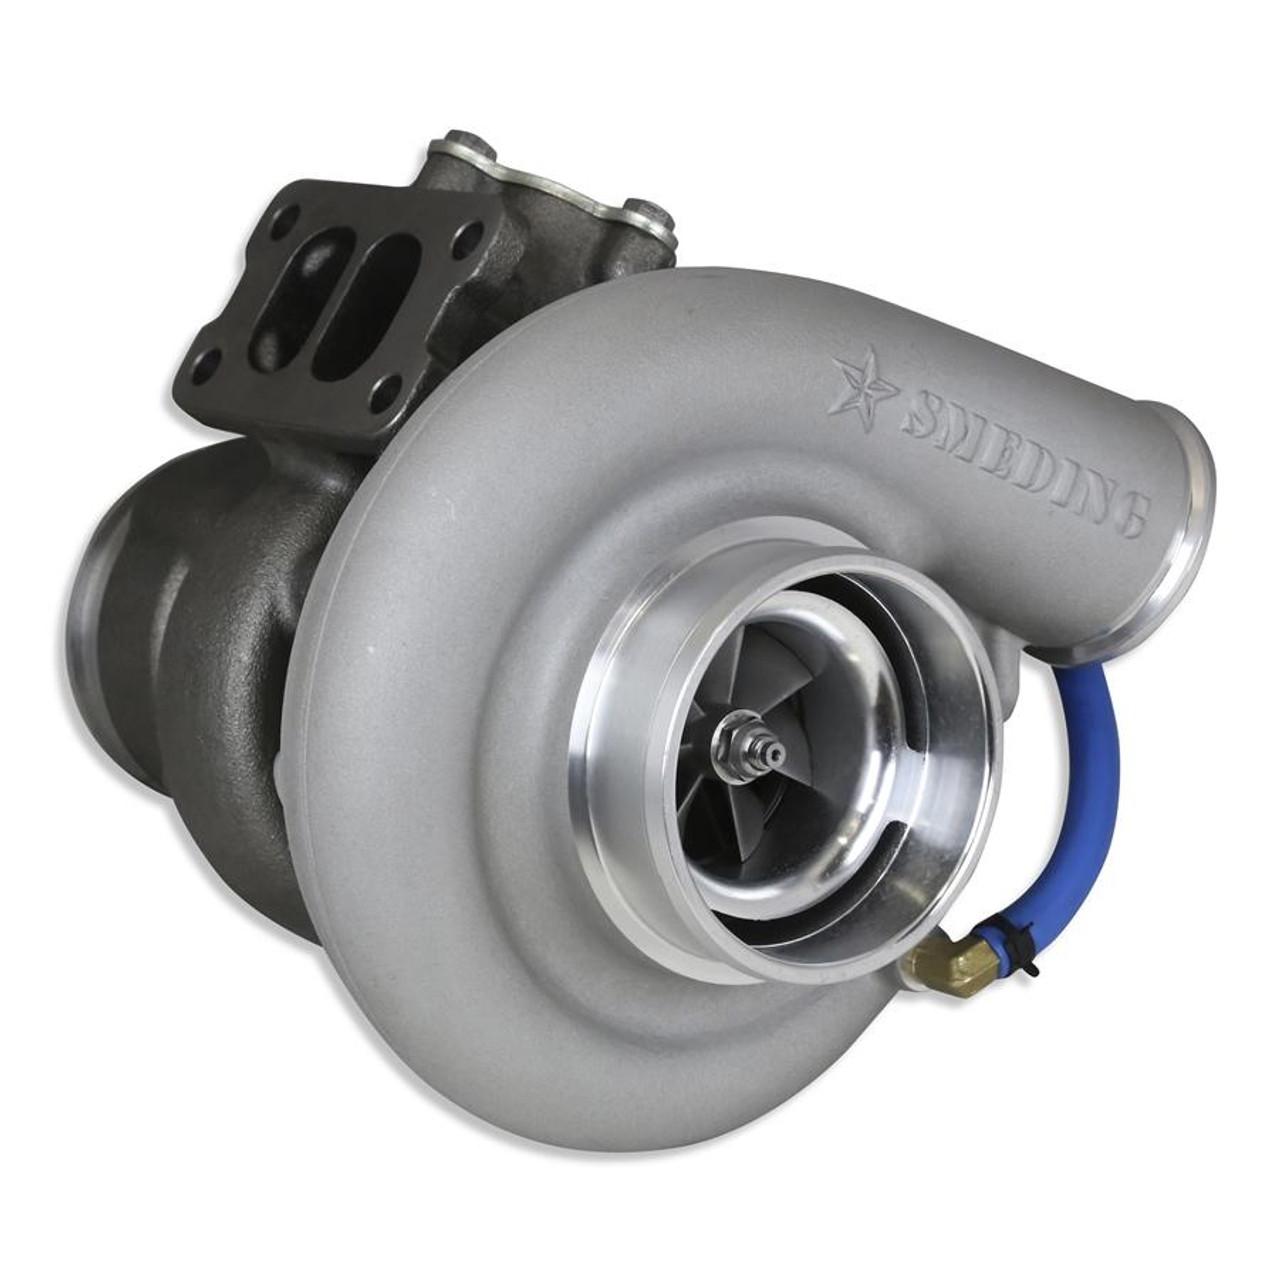 Smeding Diesel S366 Billet Drop in Turbo